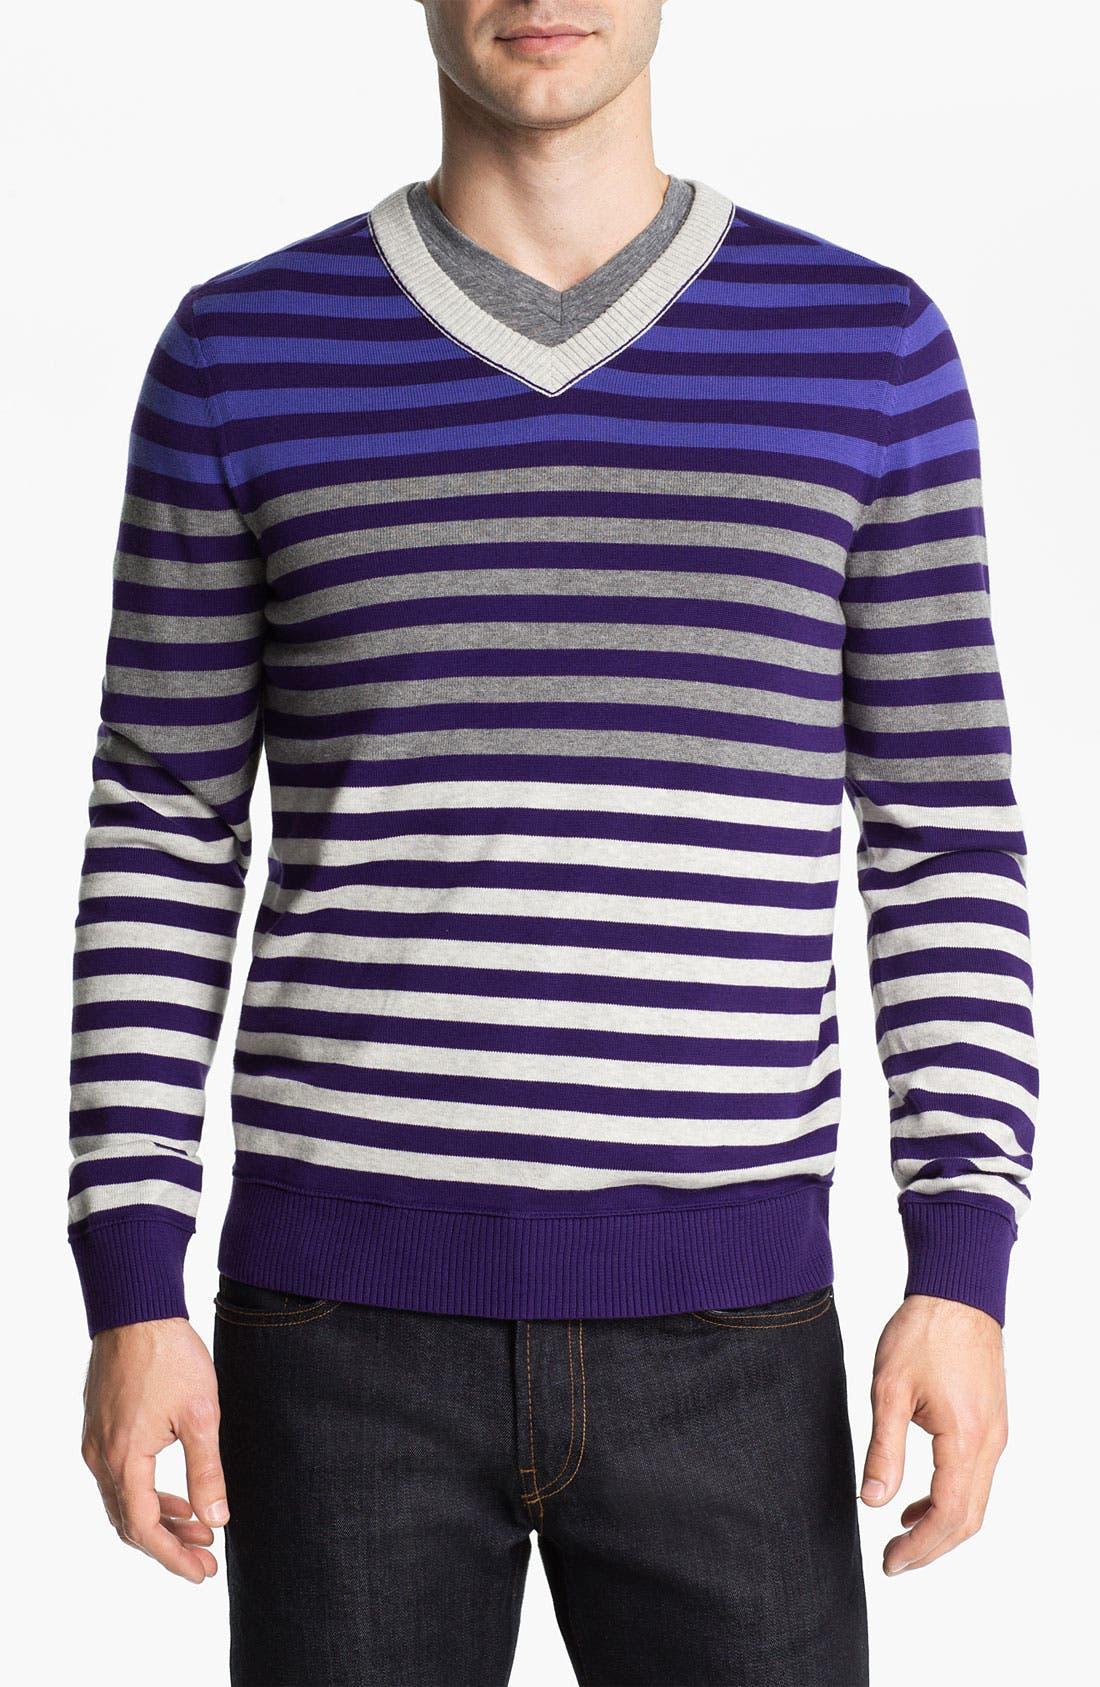 Main Image - Public Opinion Stripe V-Neck Sweater